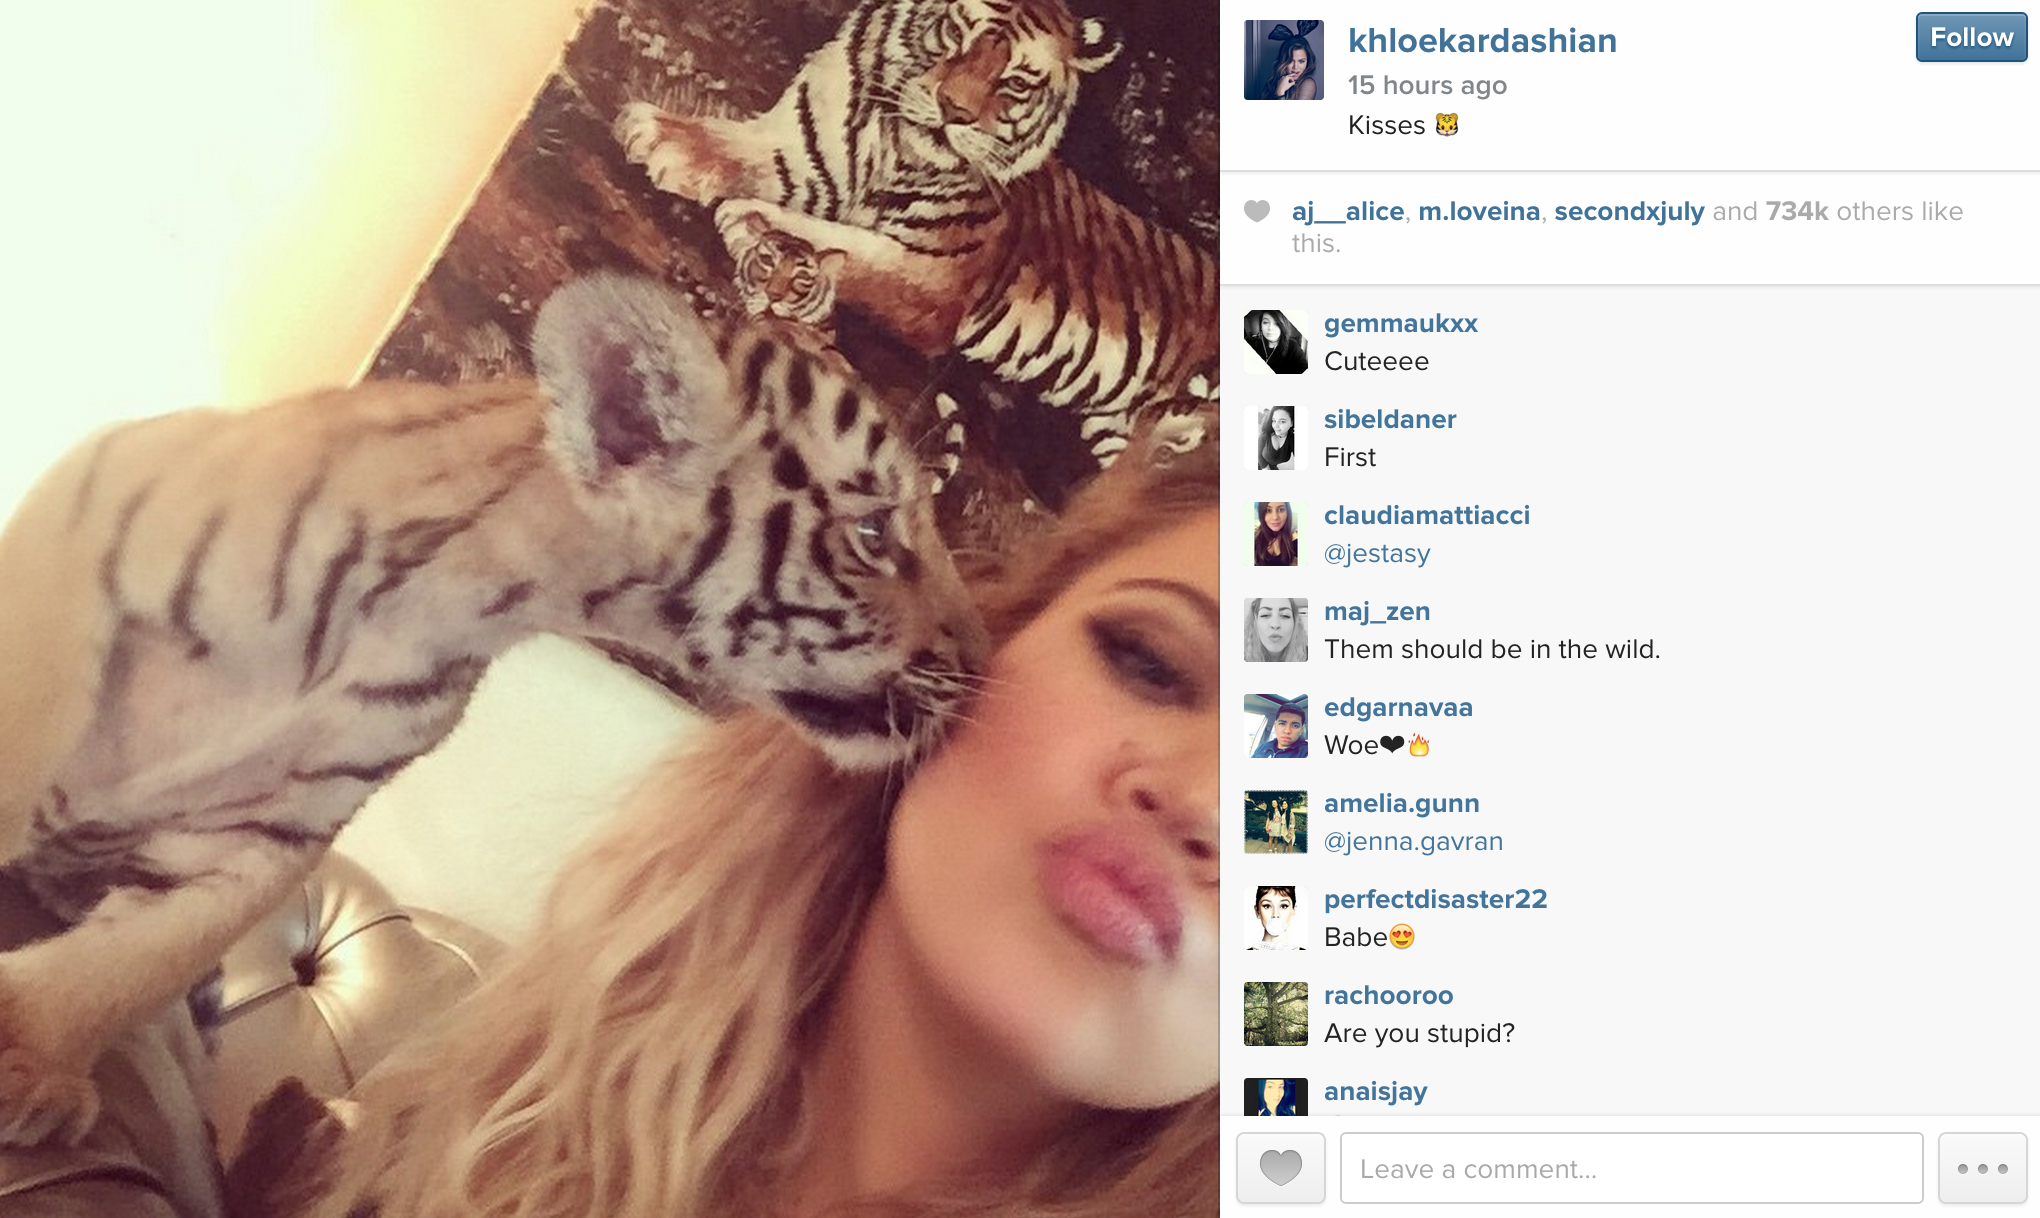 Animal rights activists roar with anger over Khloe Kardashian's Dubai tiger selfie! | Al Bawaba